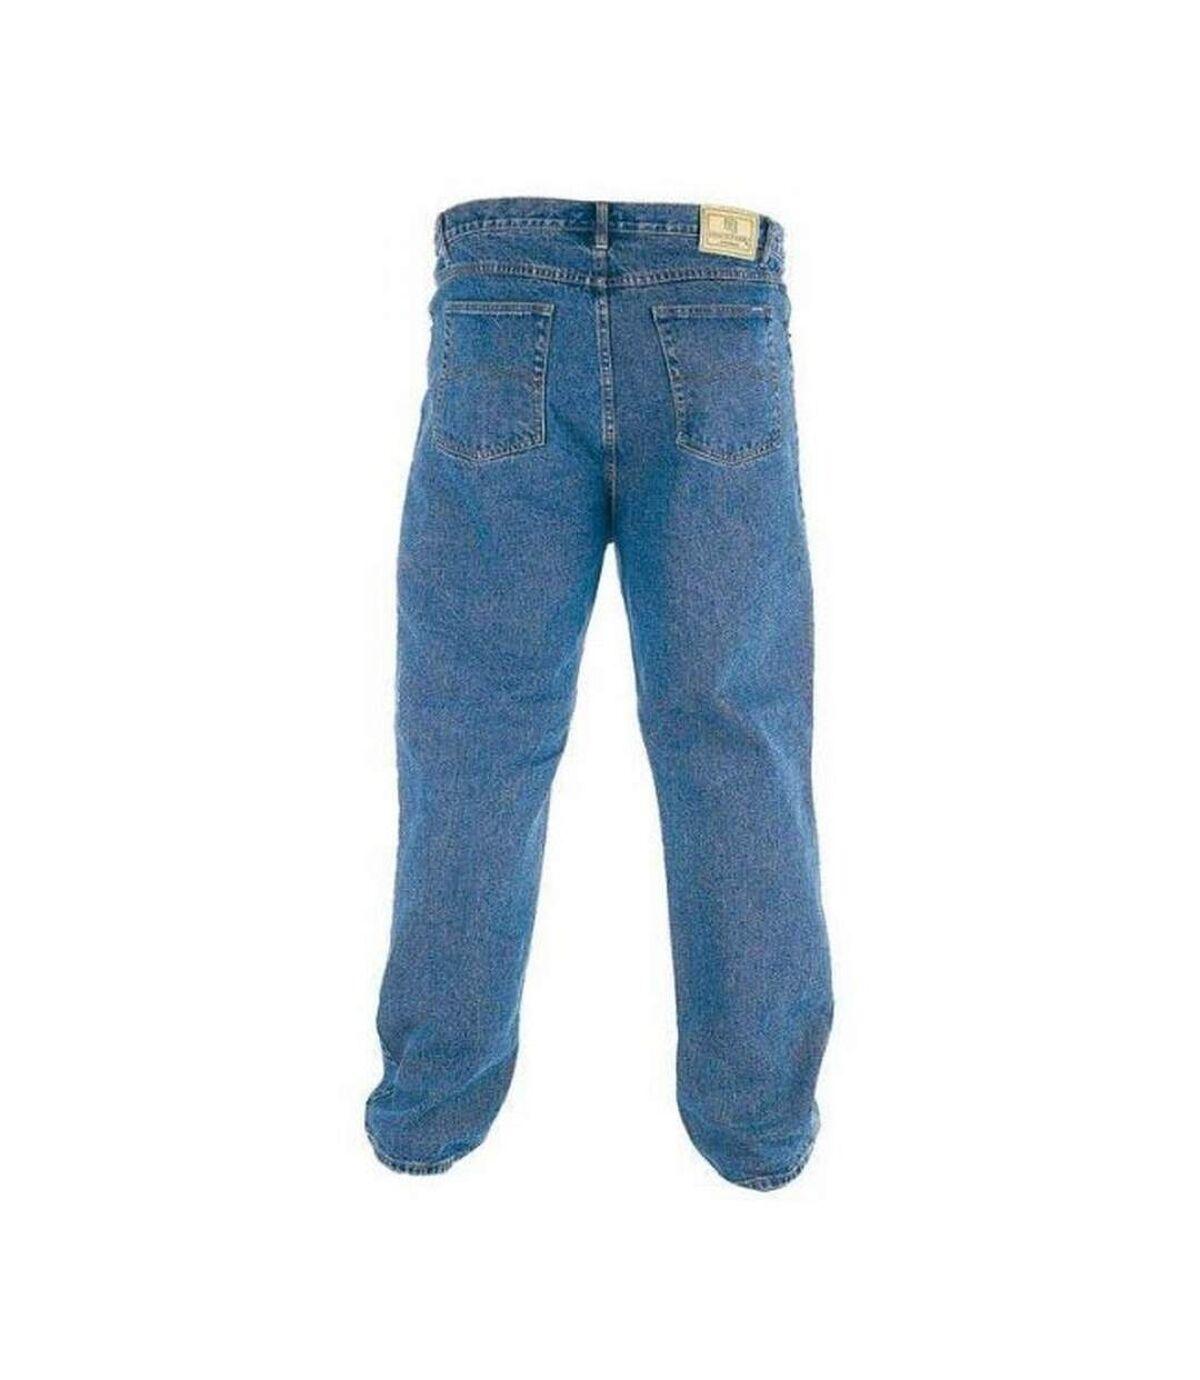 Duke Mens Rockford Tall Comfort Fit Jeans (Stonewash) - UTDC161